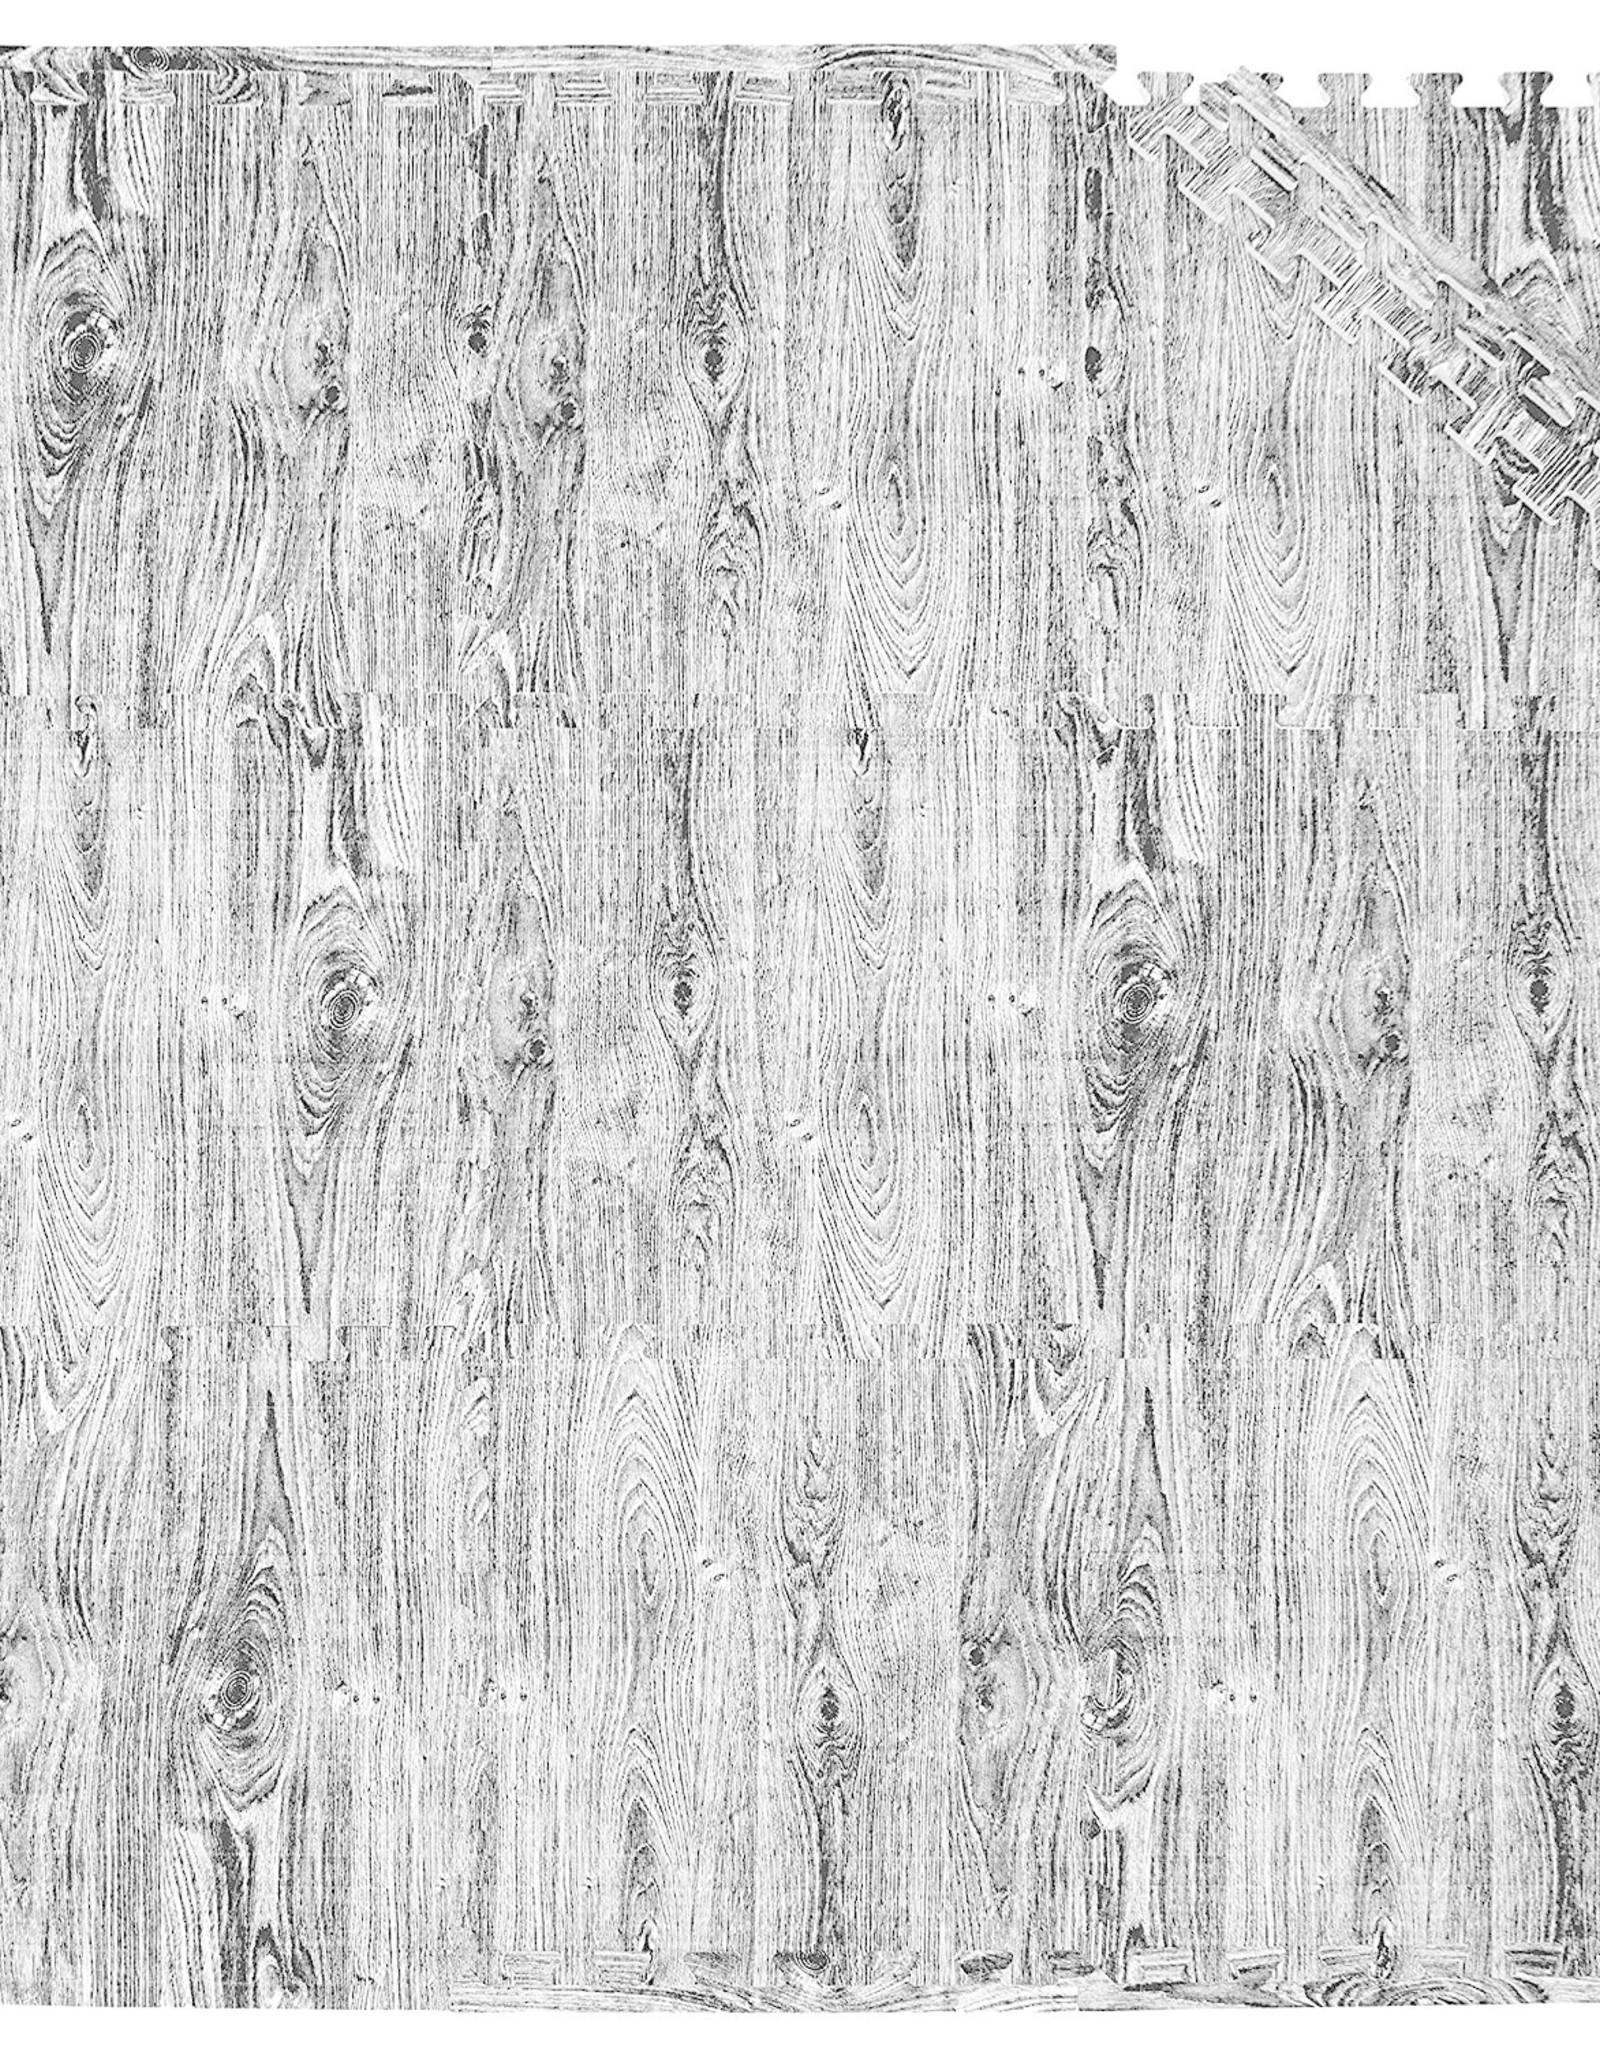 TADPOLE HOME/SLEEPING PARTNER INTL Tadpoles 9 Piece Playmat Set, Grey